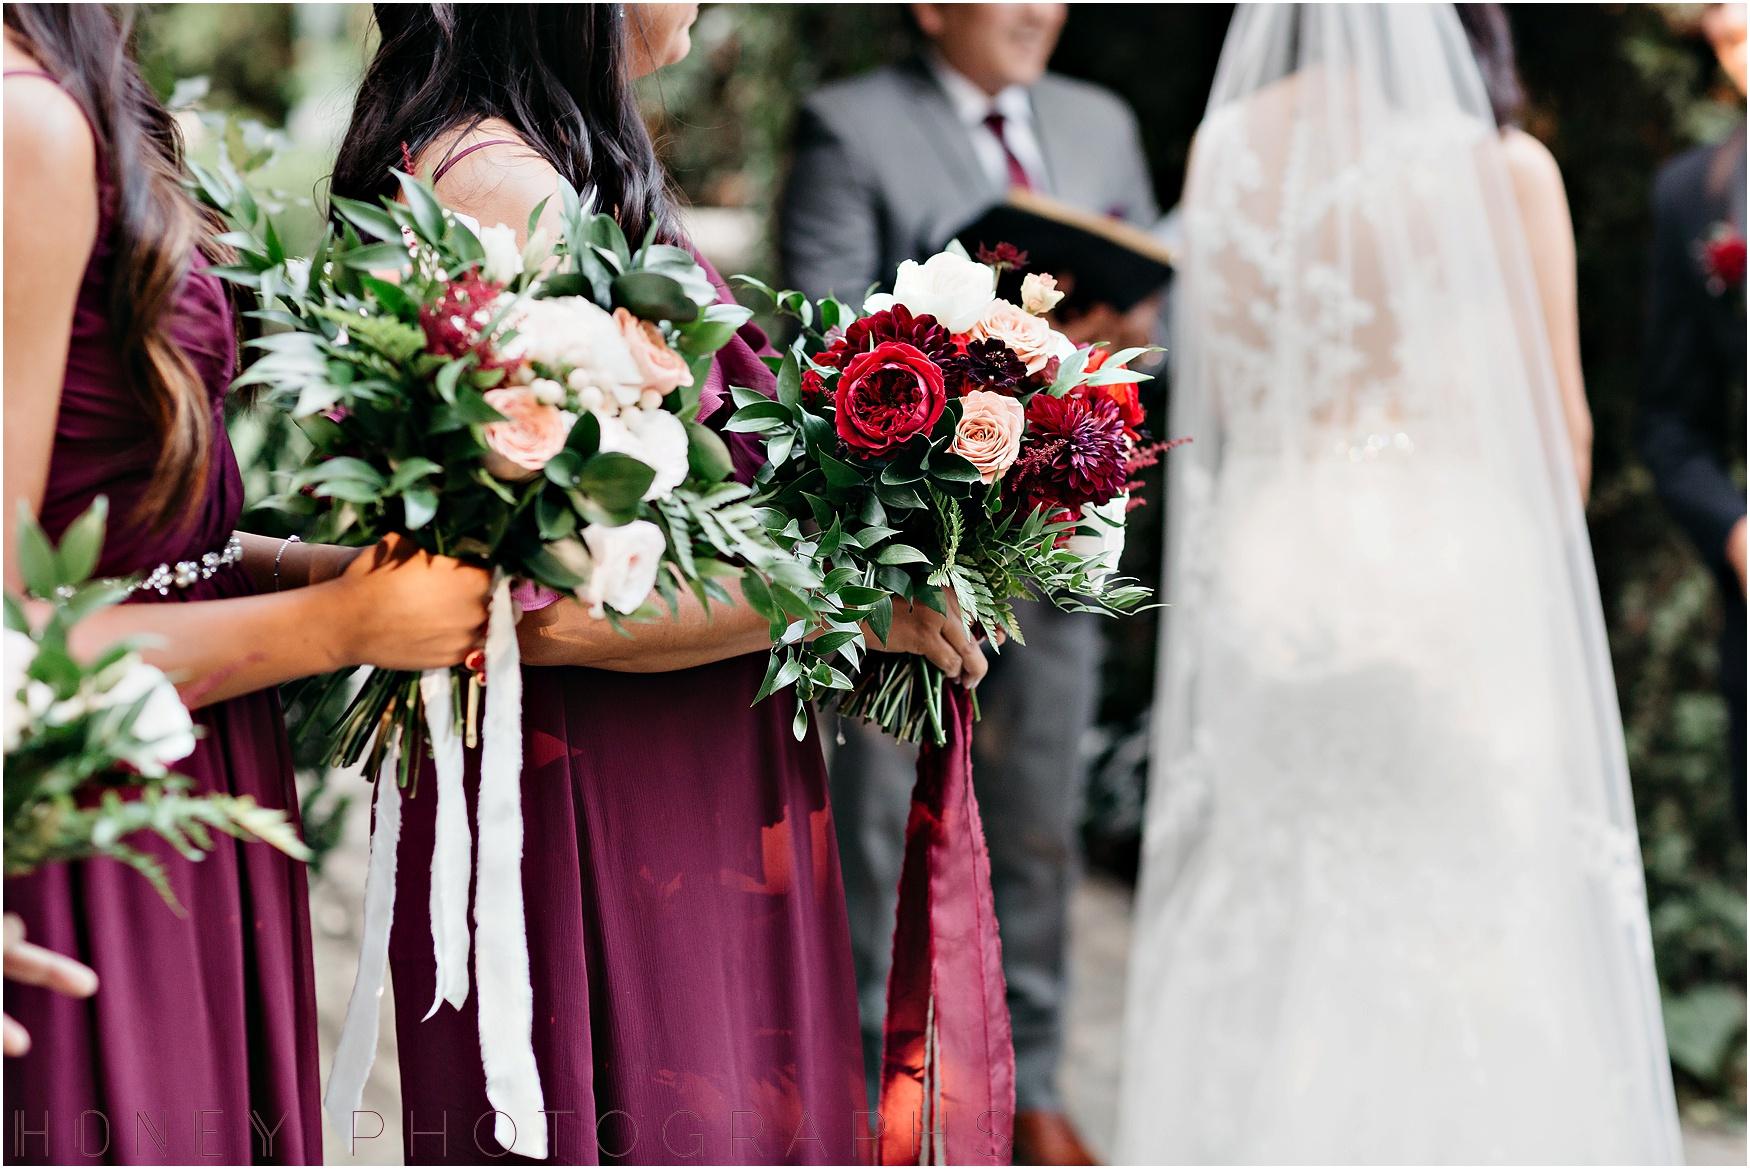 twin_oaks_garden_estate_fall_winter_burgundy_wedding021.jpg